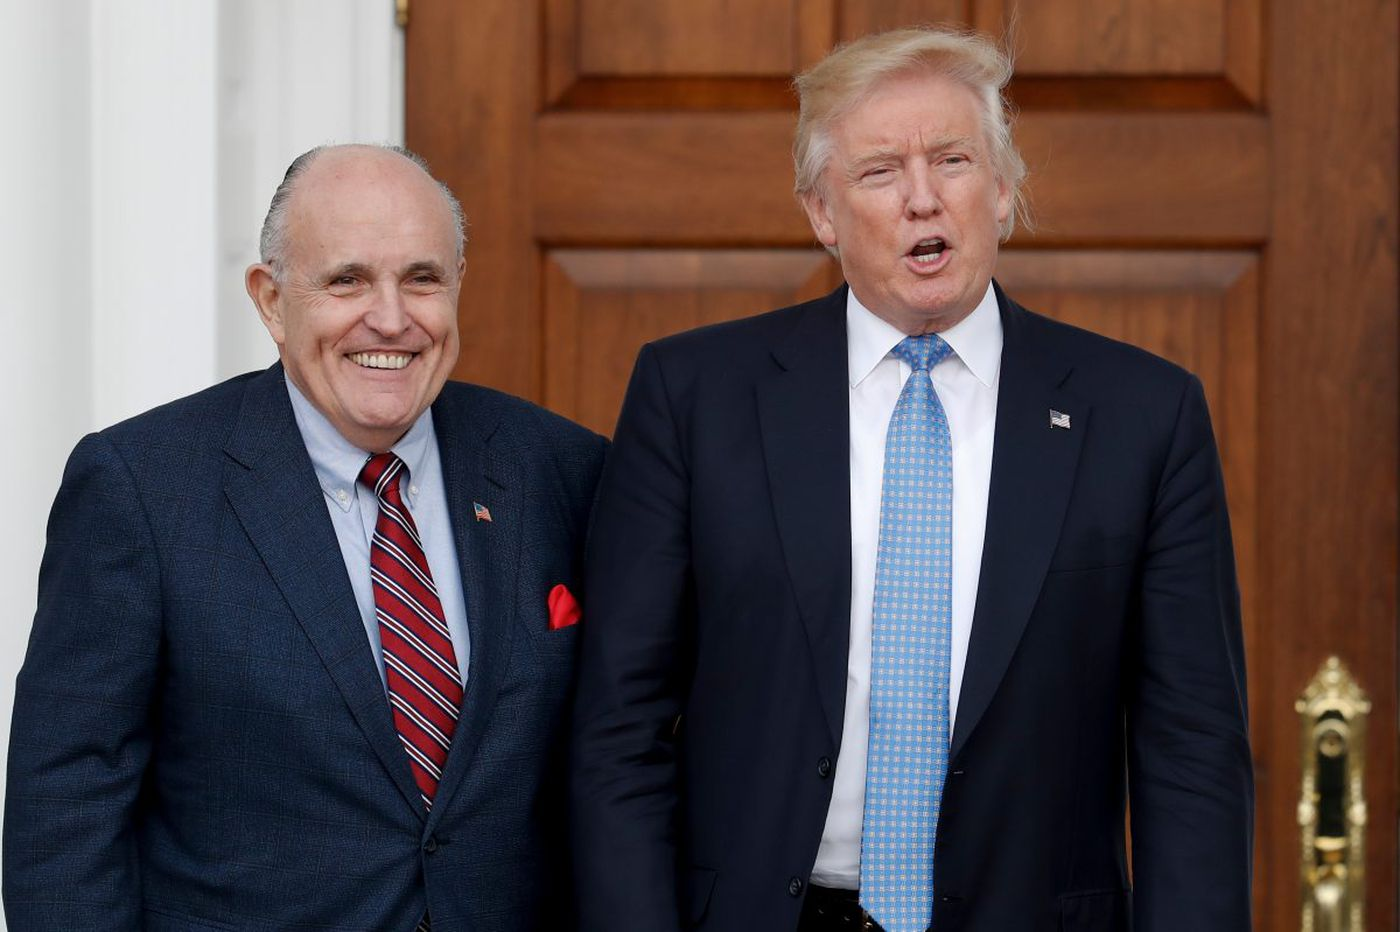 Rudy Giuliani: Inspiration for a new get-'er-done attitude?   Baer